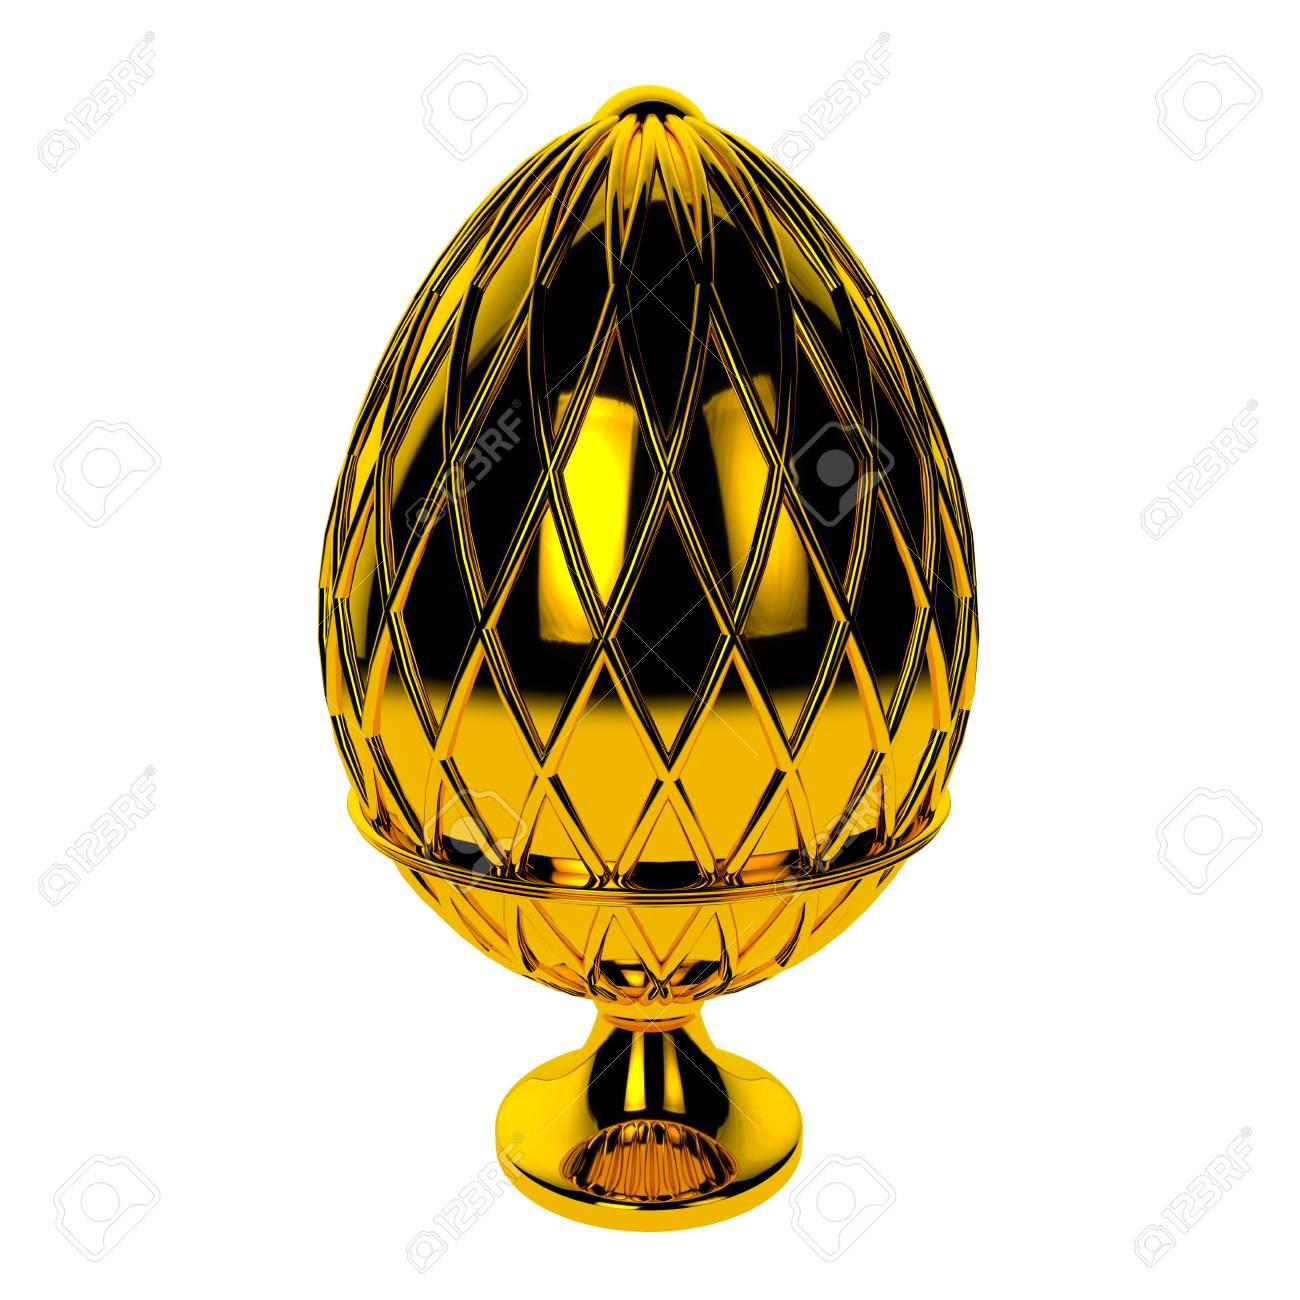 Jewelry egg. 3D render. Stock Photo - 75878313